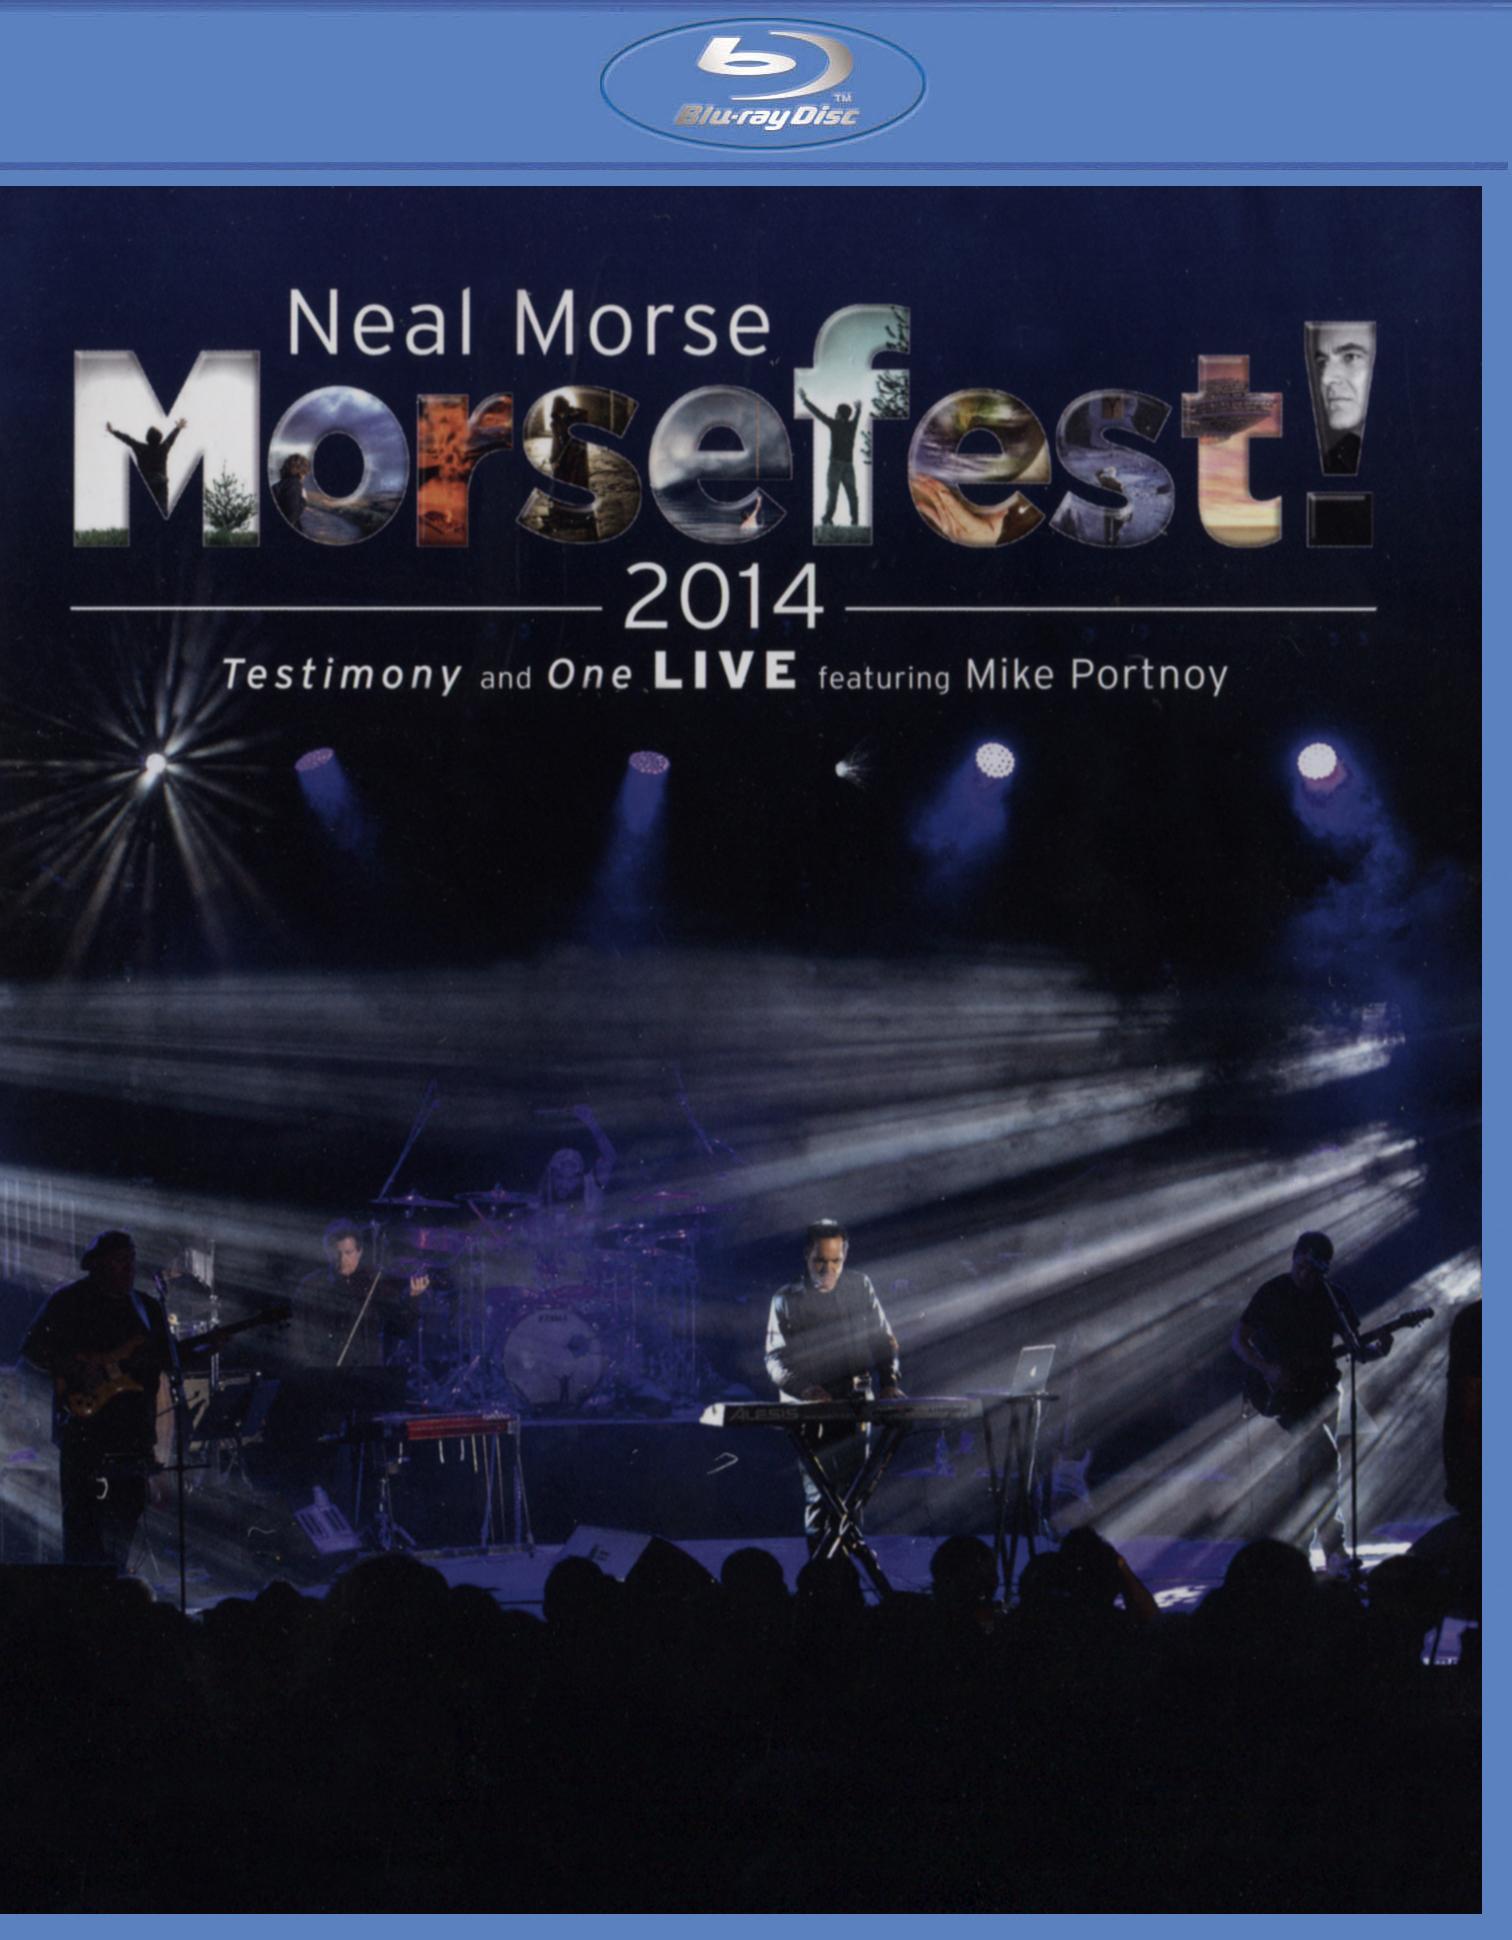 Neal Morse: Morsefest 2014